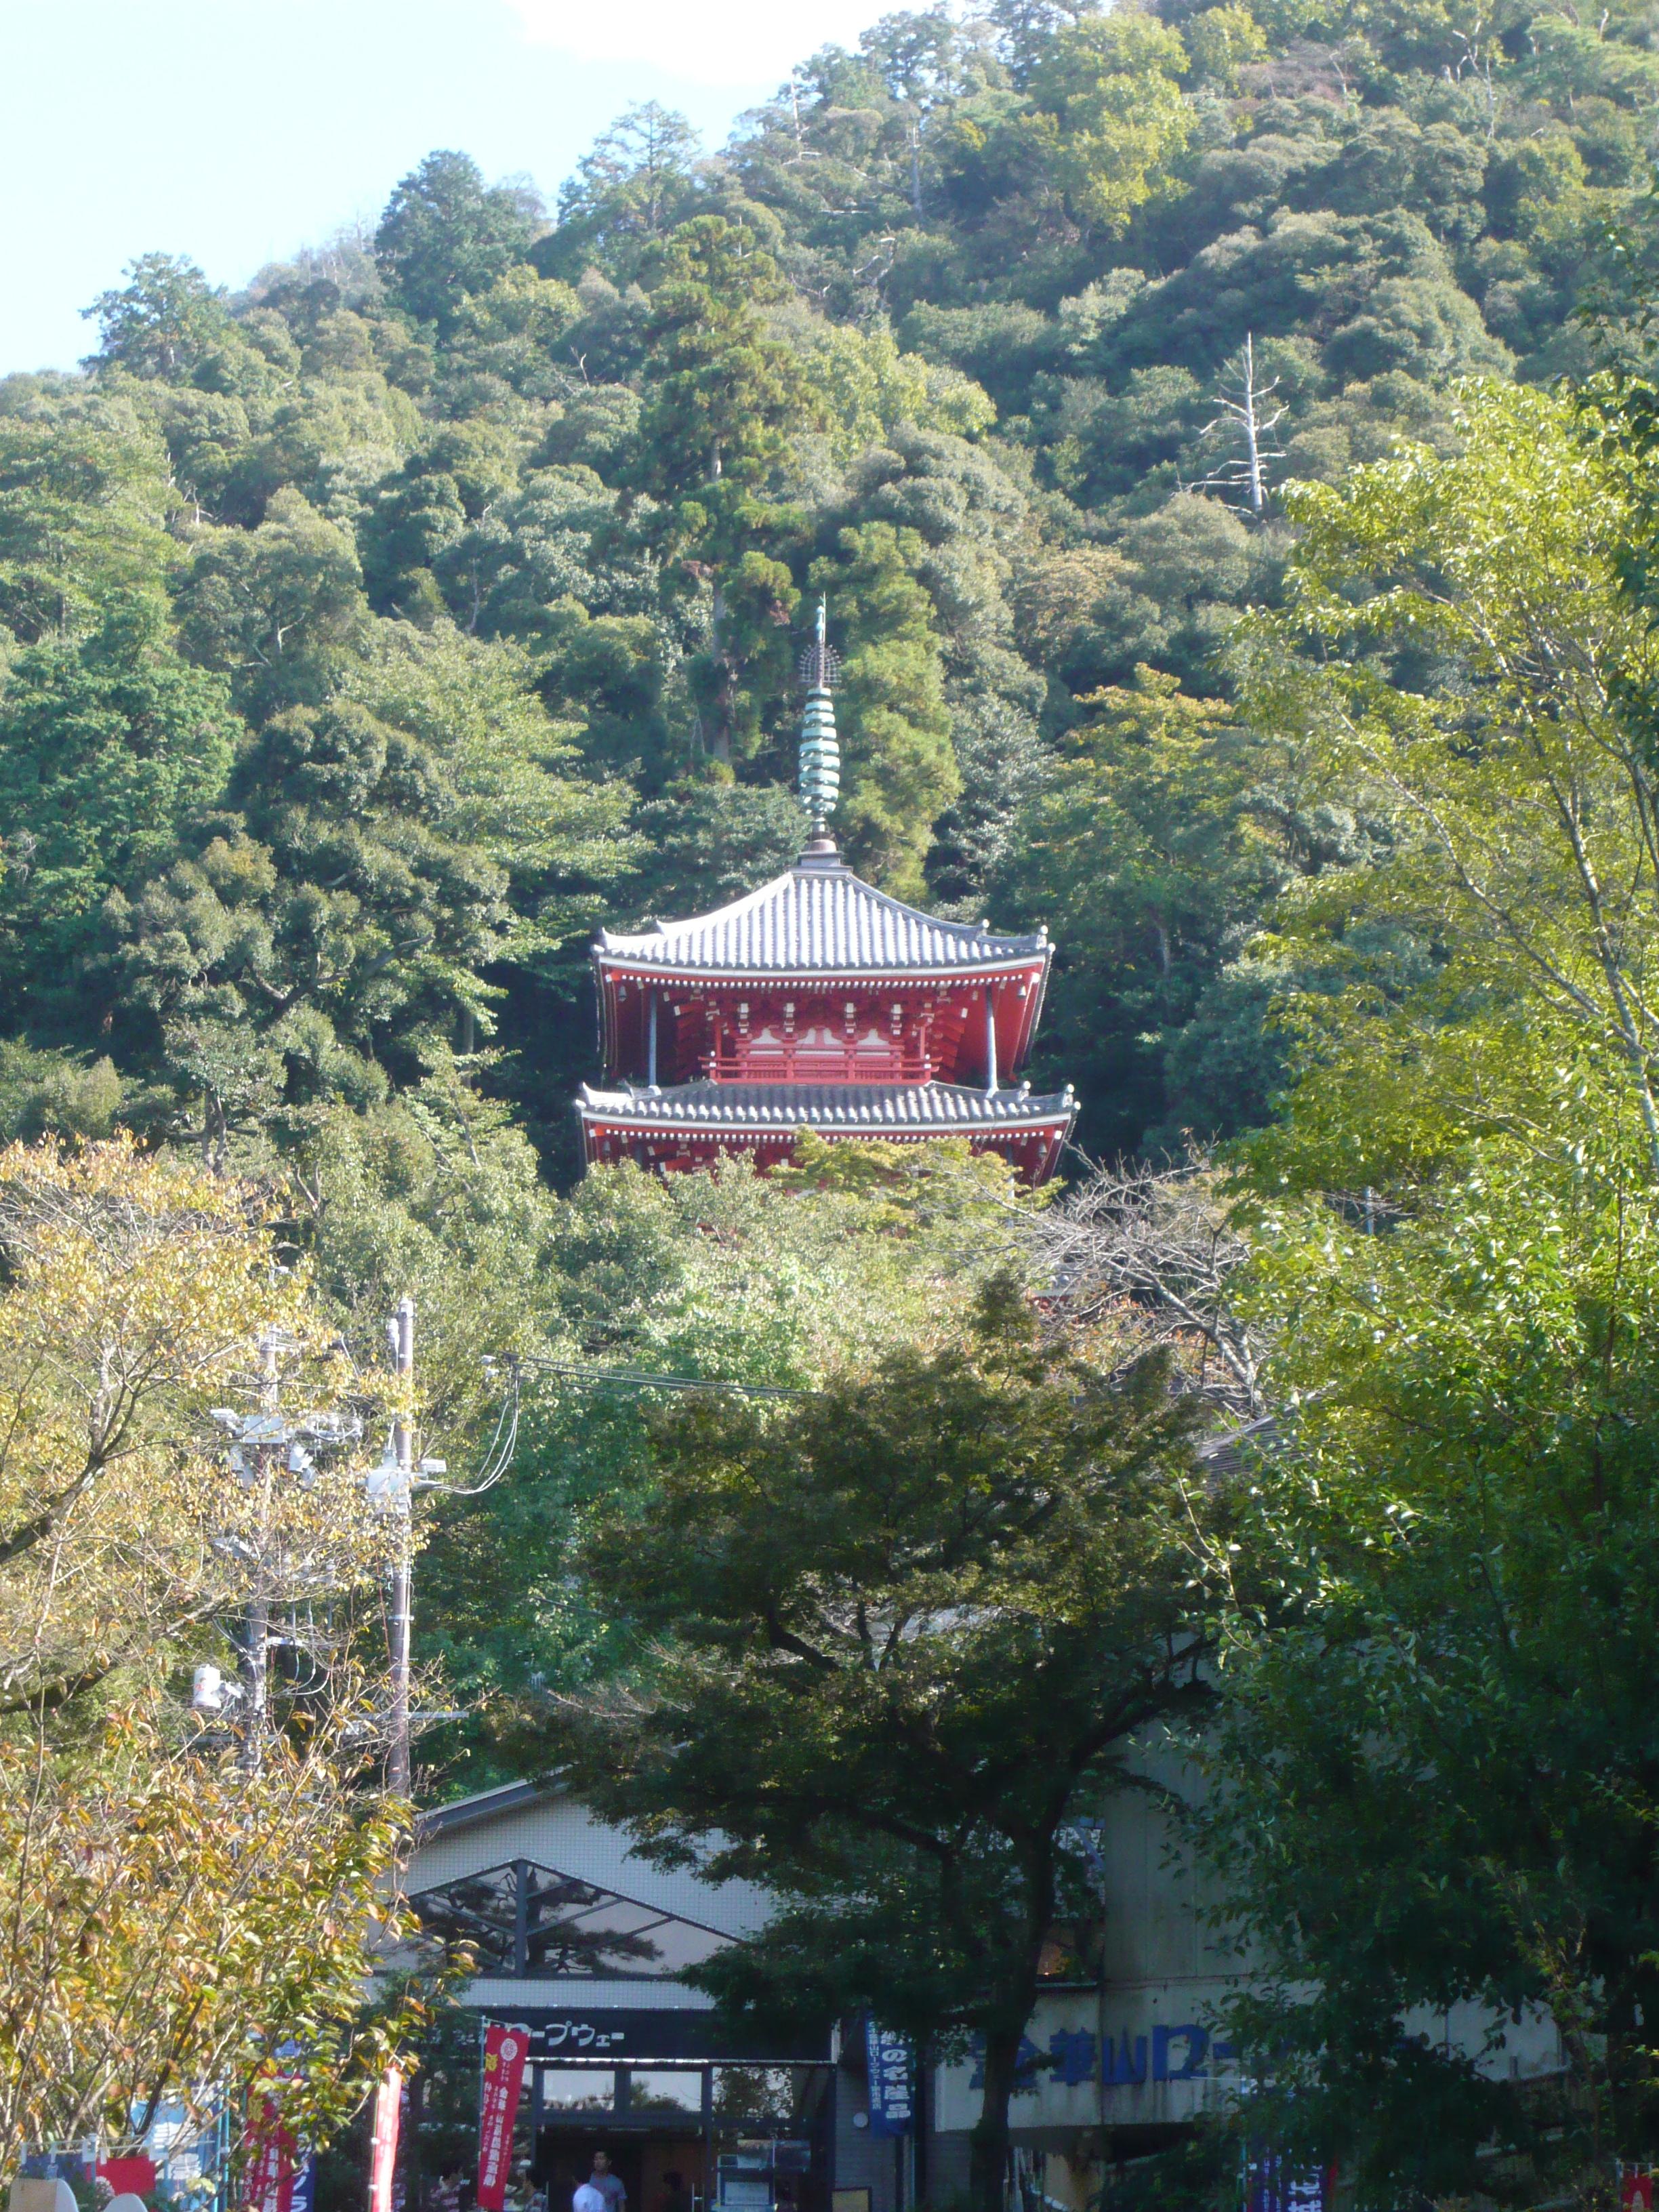 3-storied Pagoda in Gifu Park 1.JPG